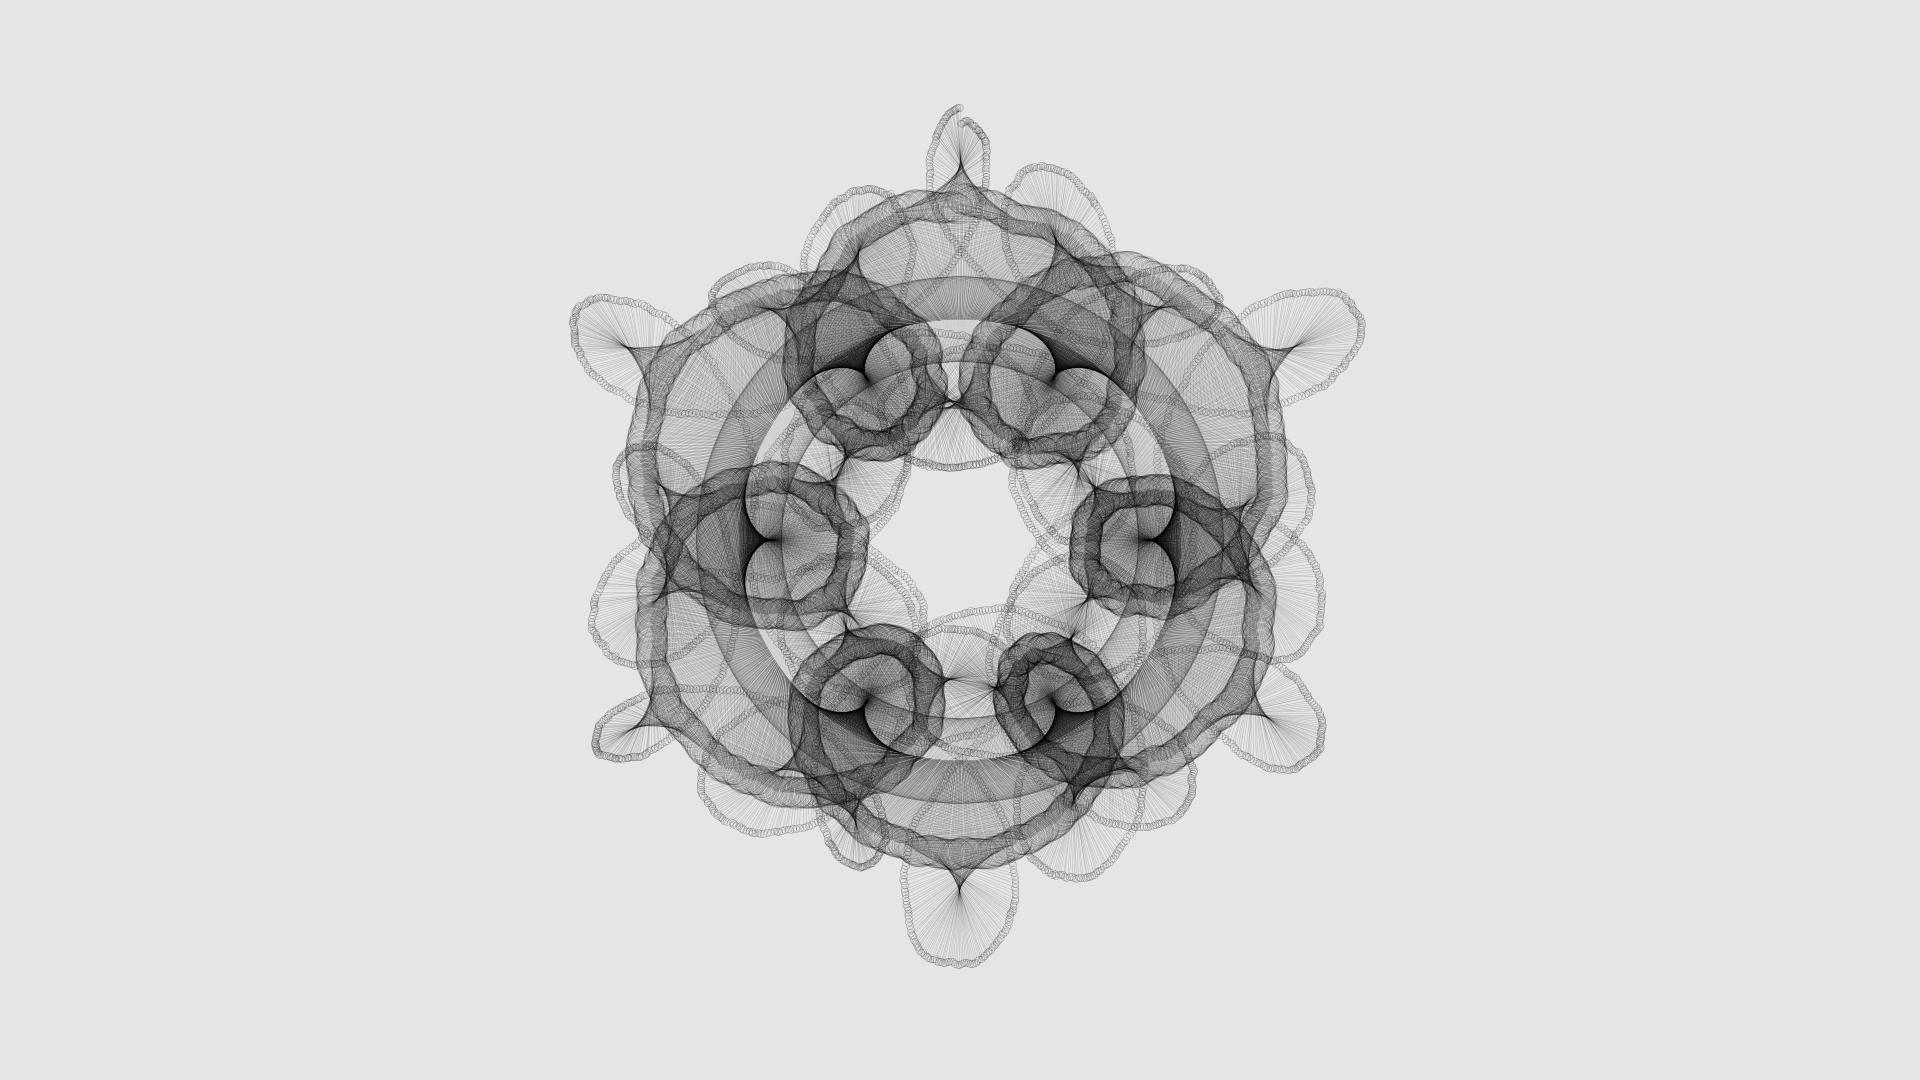 orrery_moon_and_moonlet_1_percent-showlines-showcircles-showearth-moonlet_retrograde-M5E6-F5130-855-171-O220.80124-109.397964-86.30721-D85.0-30.0-7.0.png